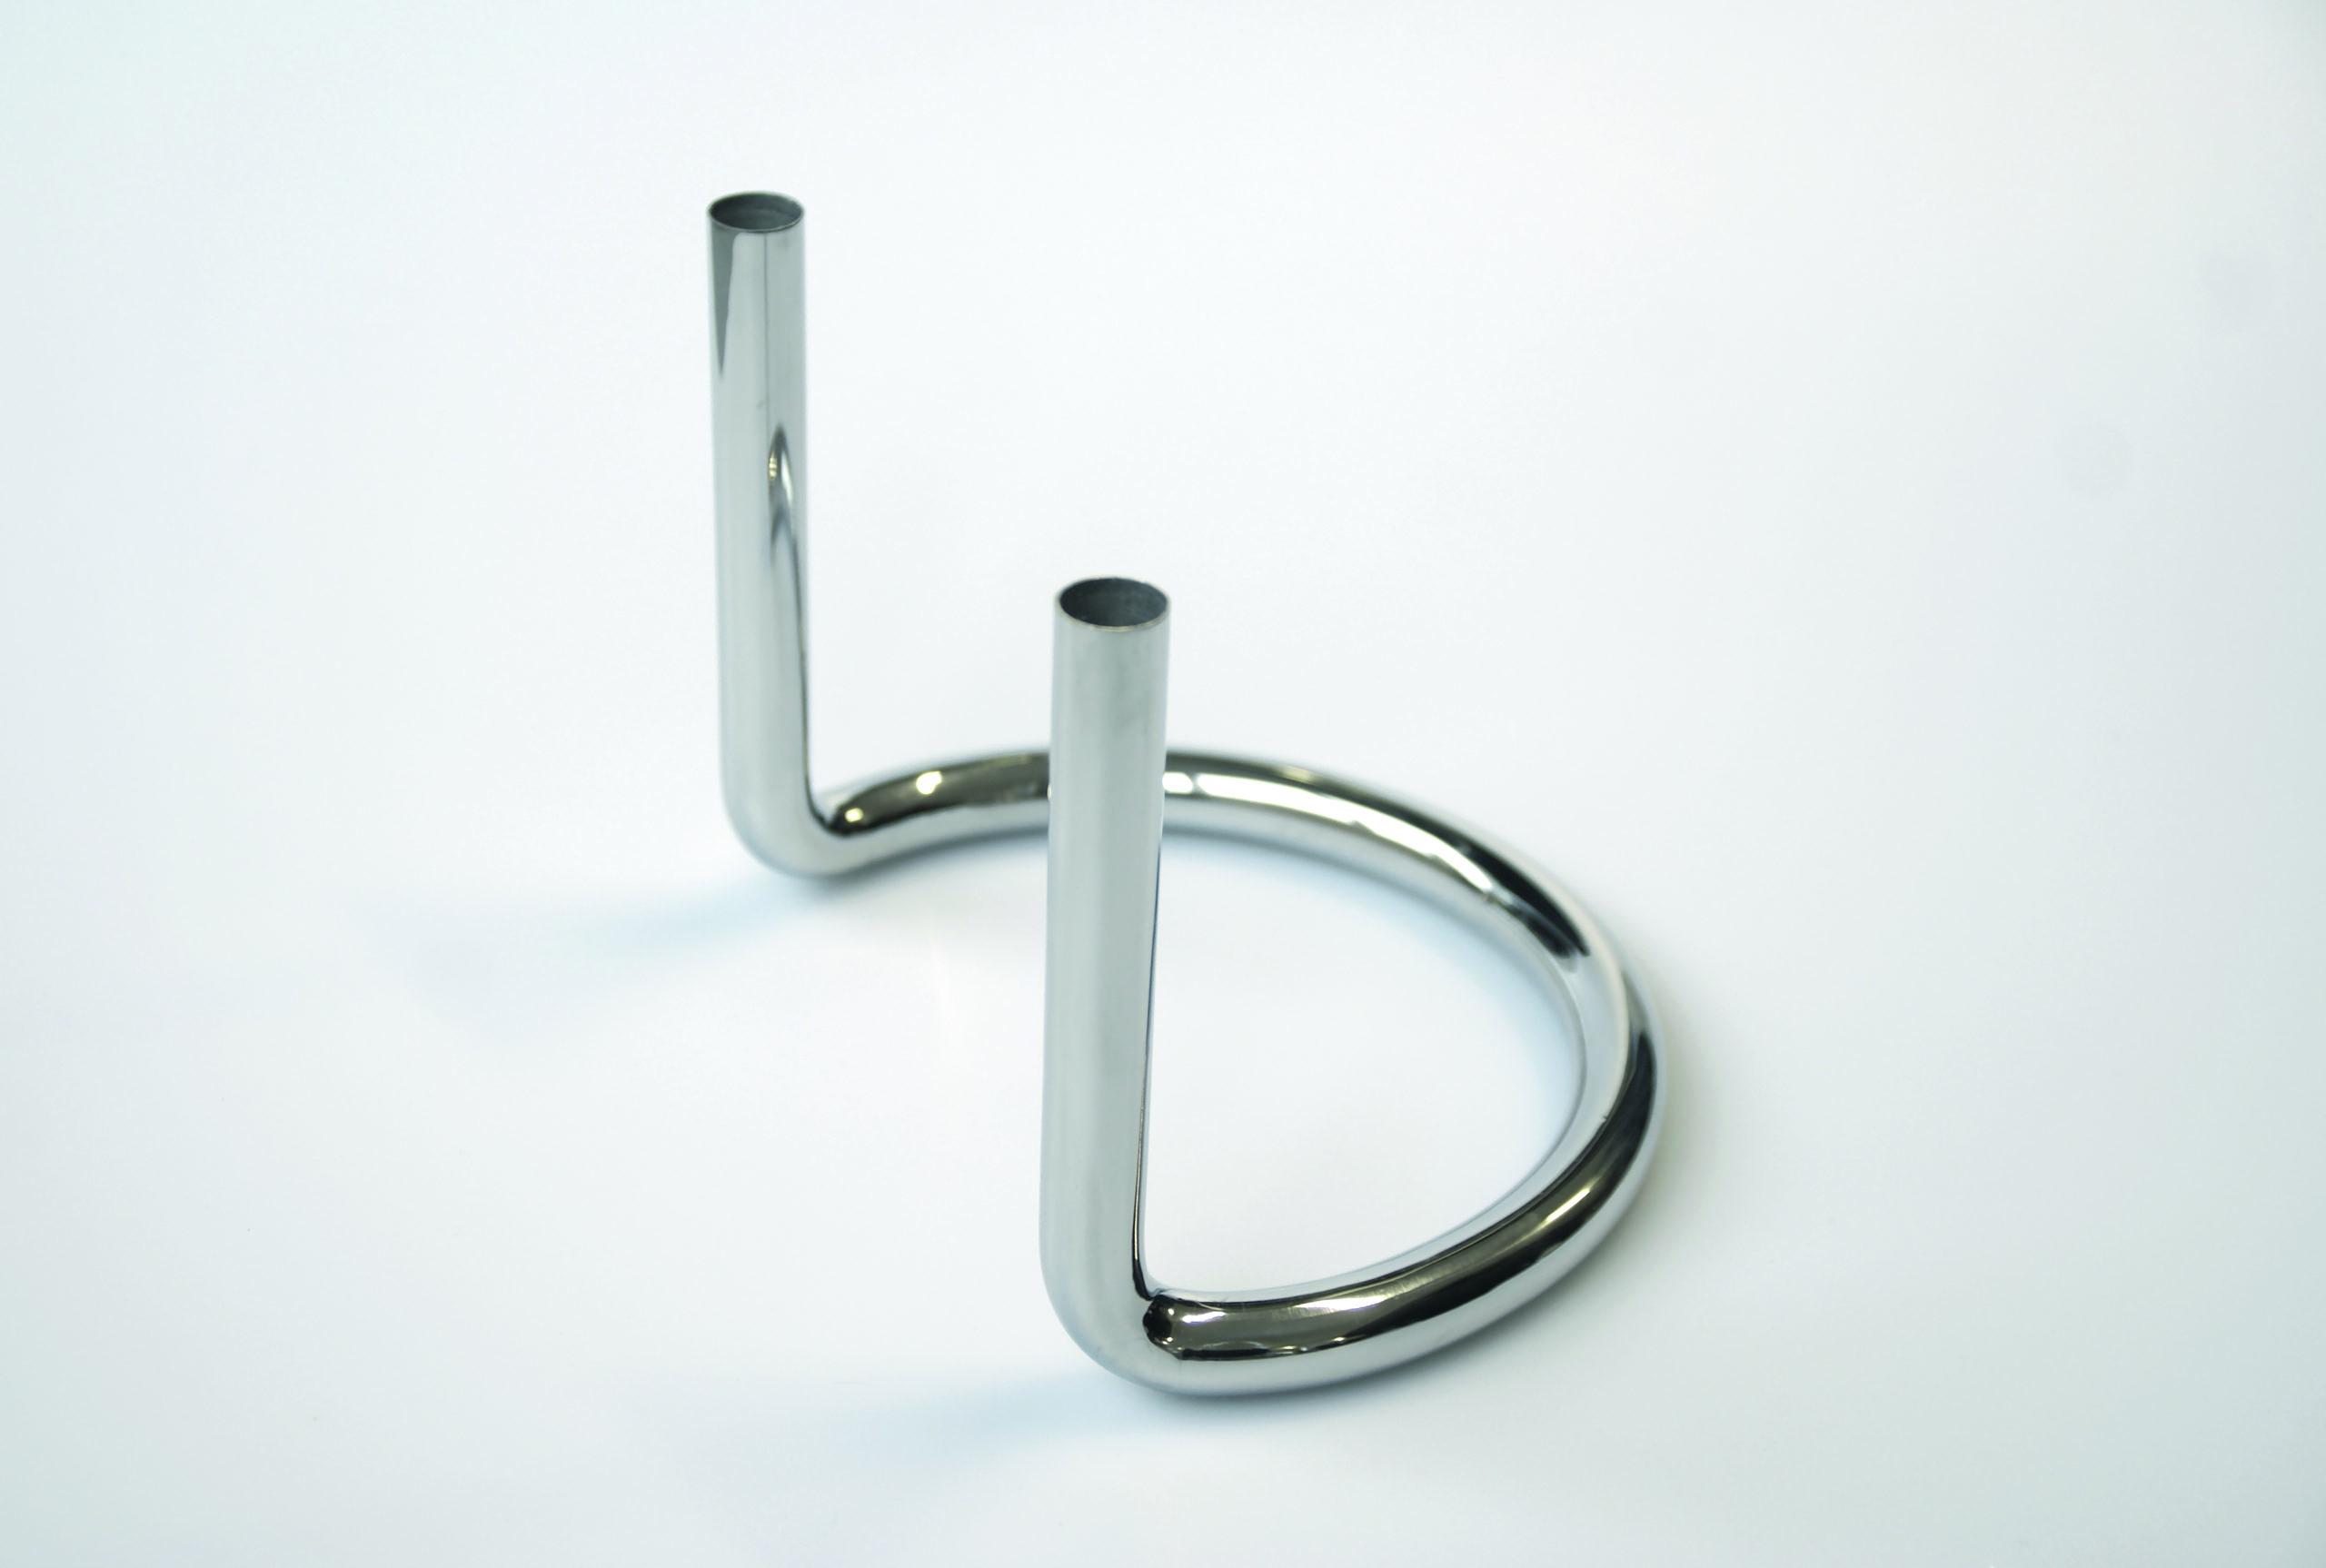 Architectmade-Gemini-Polished-Stainless-Steel-Candleholder-Peter-Karpf-2